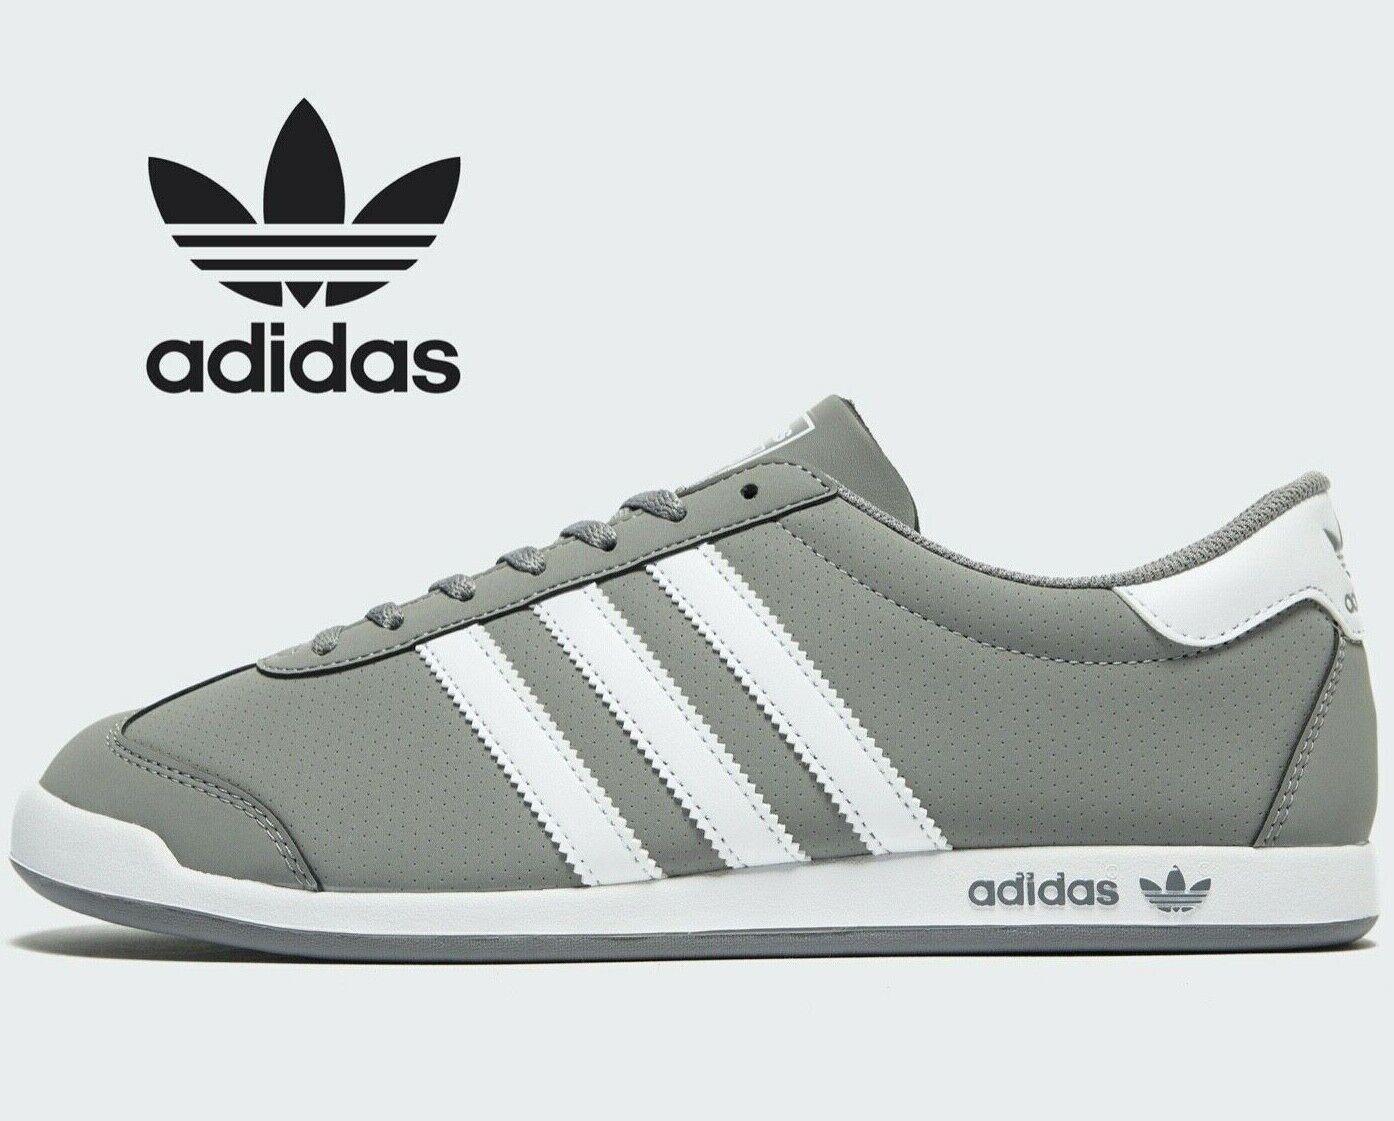 ⚫ 2019 Adidas Originals The Sneeker ® ( Men Größe UK 9 EUR 43.5  ) Weiß   grau